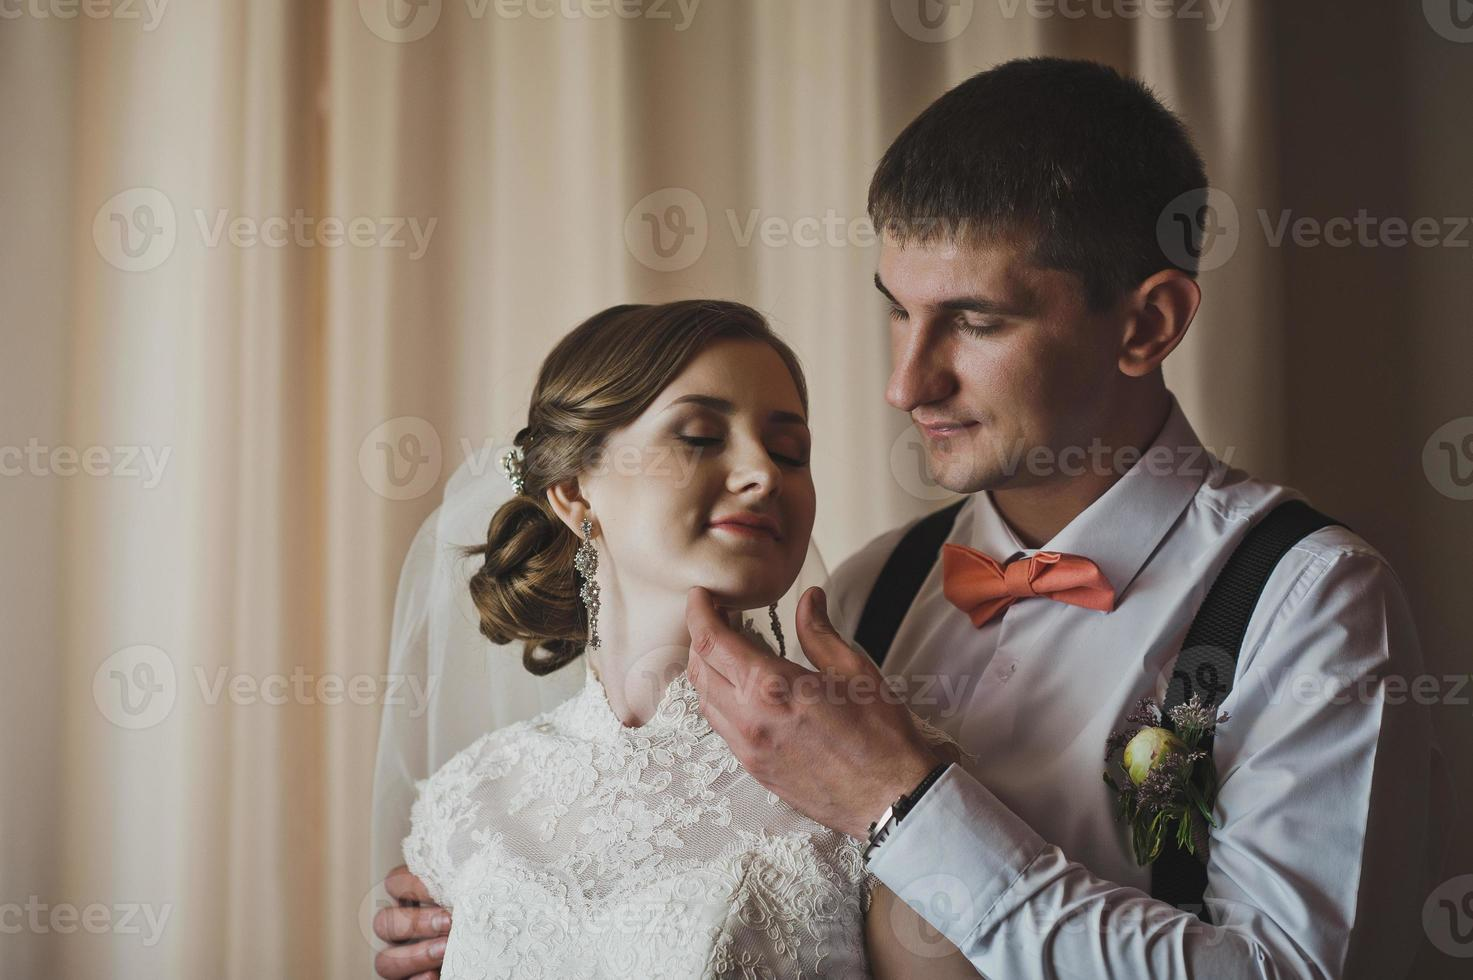 l'homme embrasse tendrement sa femme photo